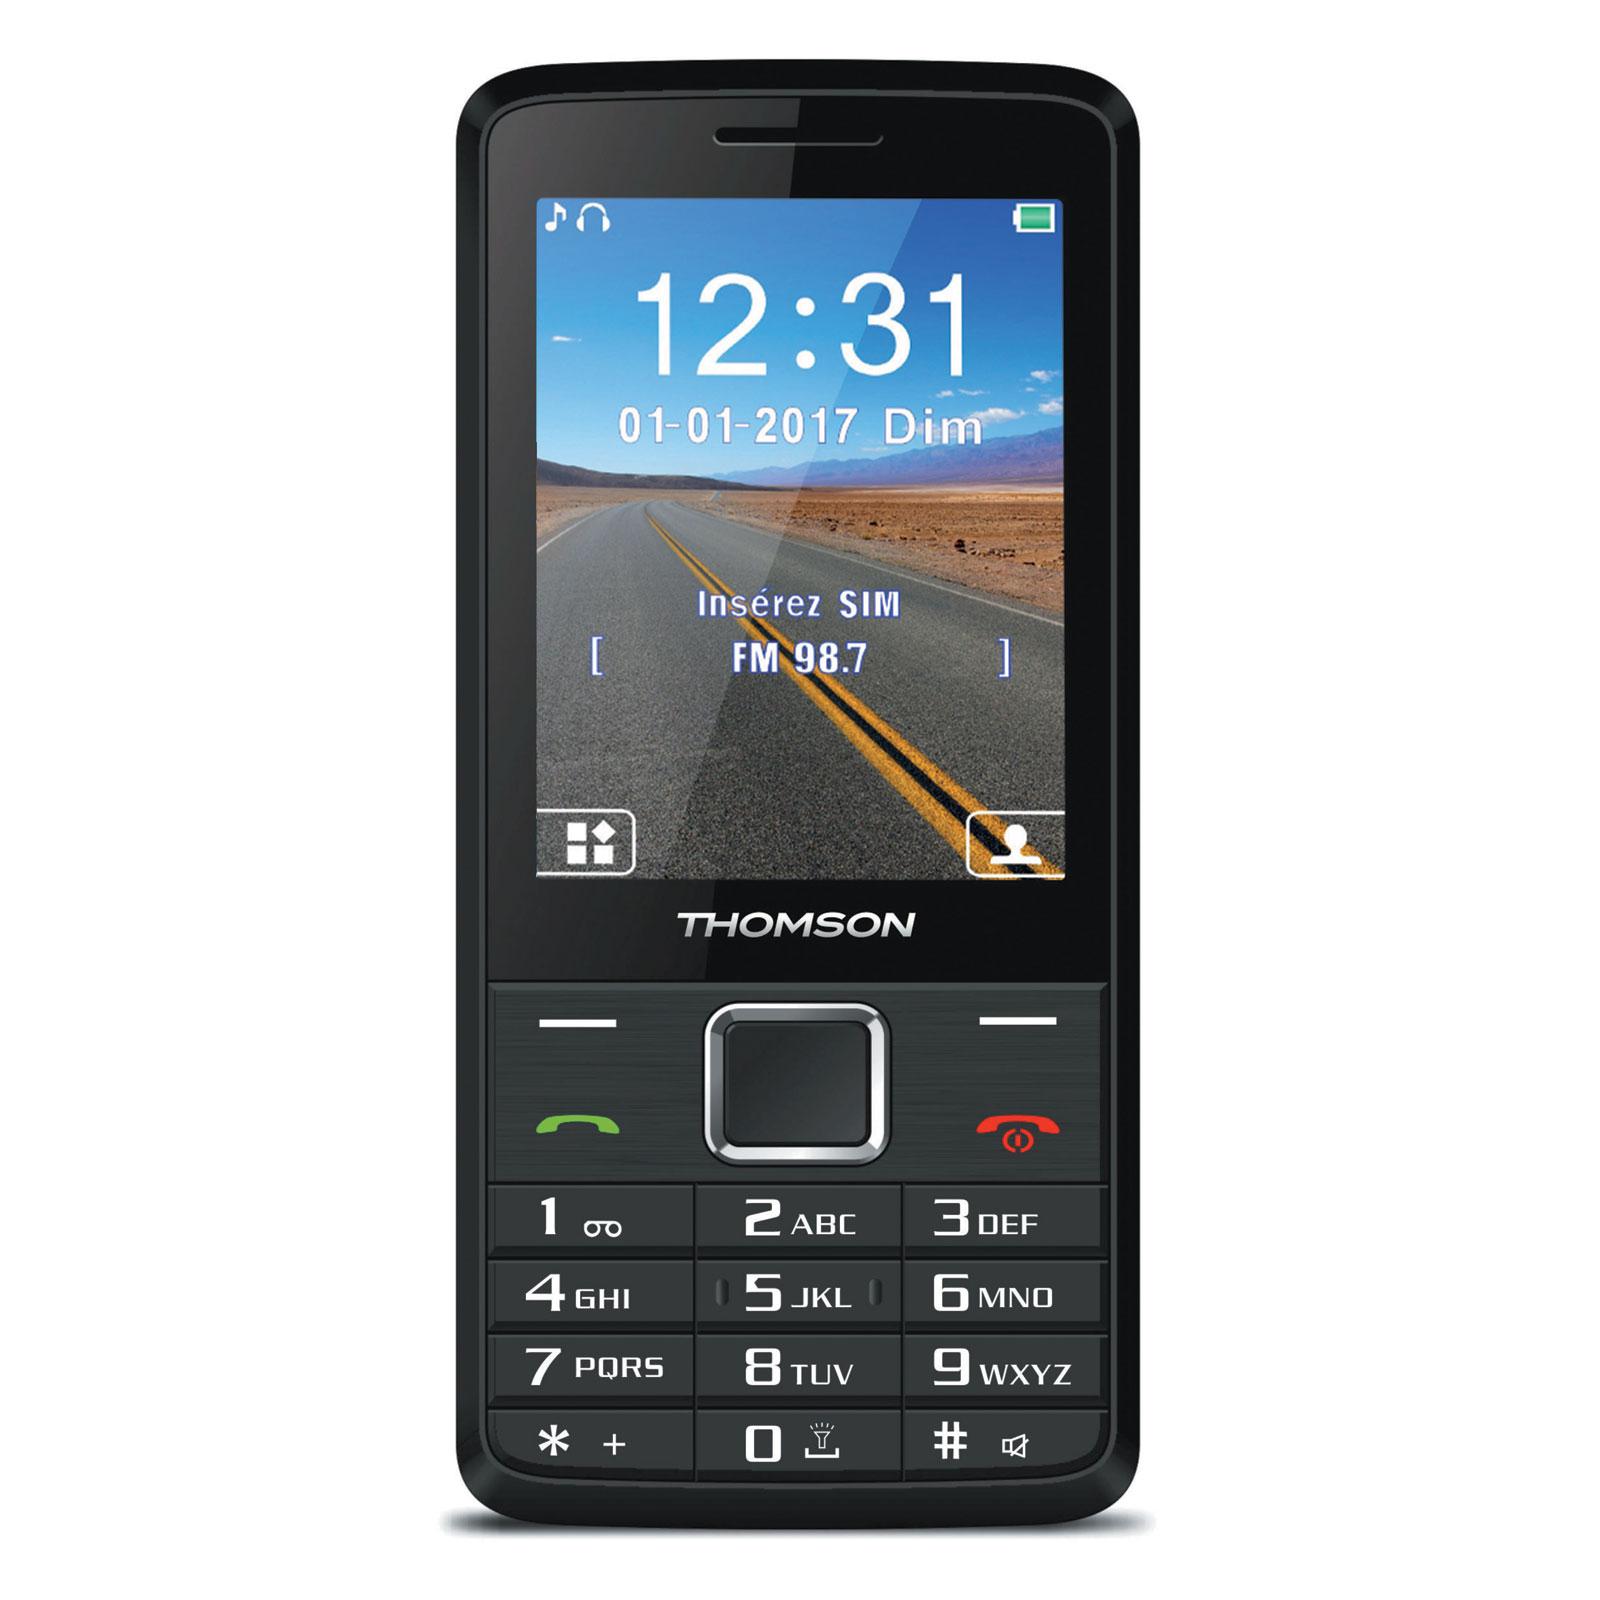 "Mobile & smartphone Thomson Tlink 28+ Noir Téléphone 2G Dual SIM - Ecran 2.8"" 240 x 320 - Bluetooth - 1400 mAh"